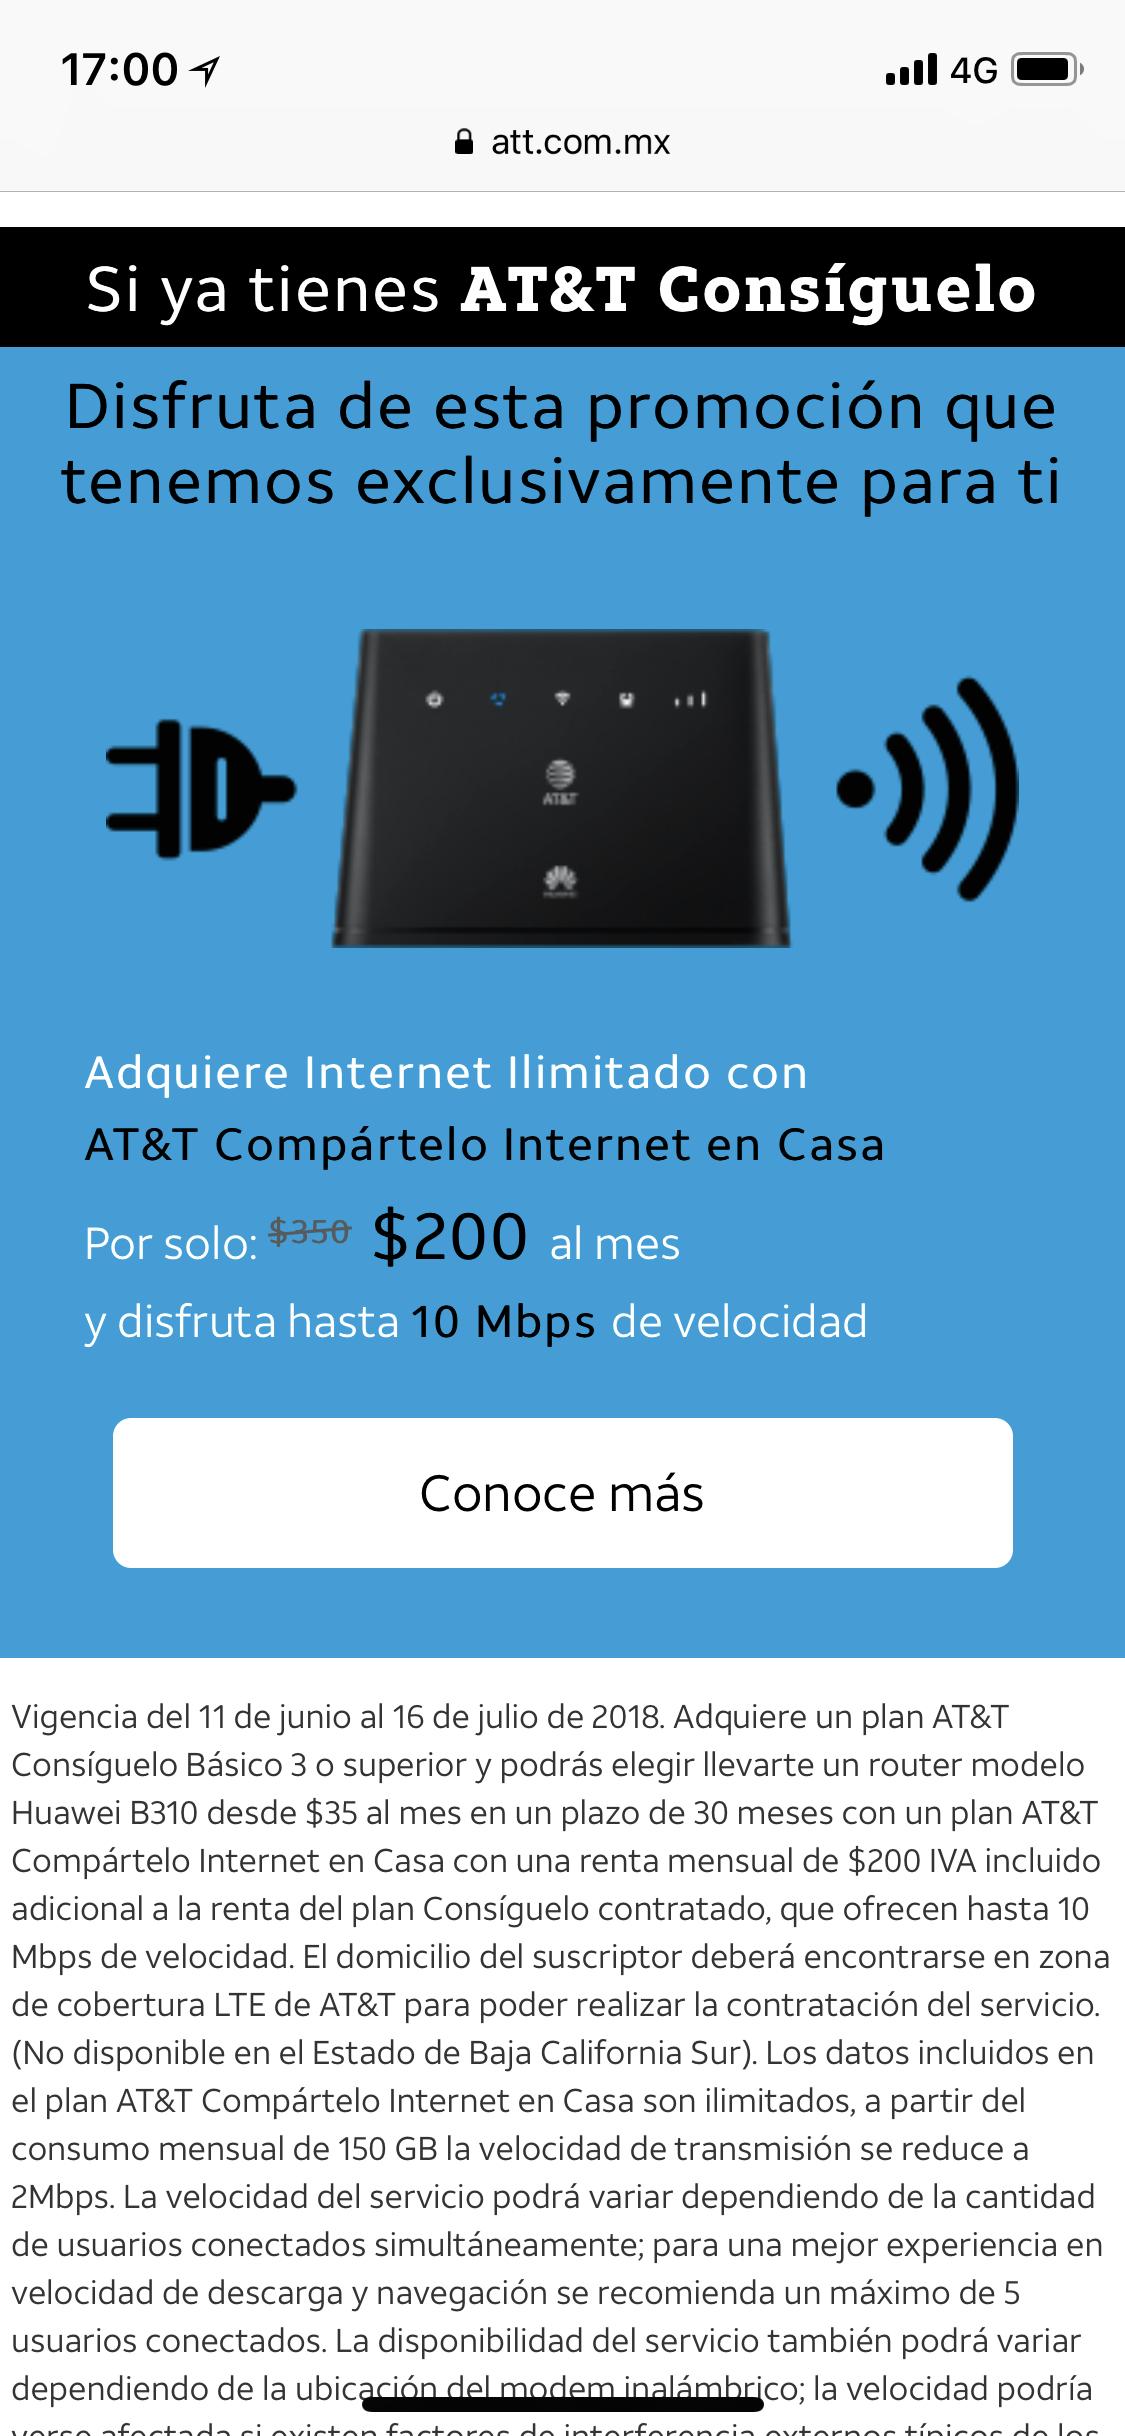 AT&T: Internet en casa $200 en lugar de $350 con AT&T Consíguelo